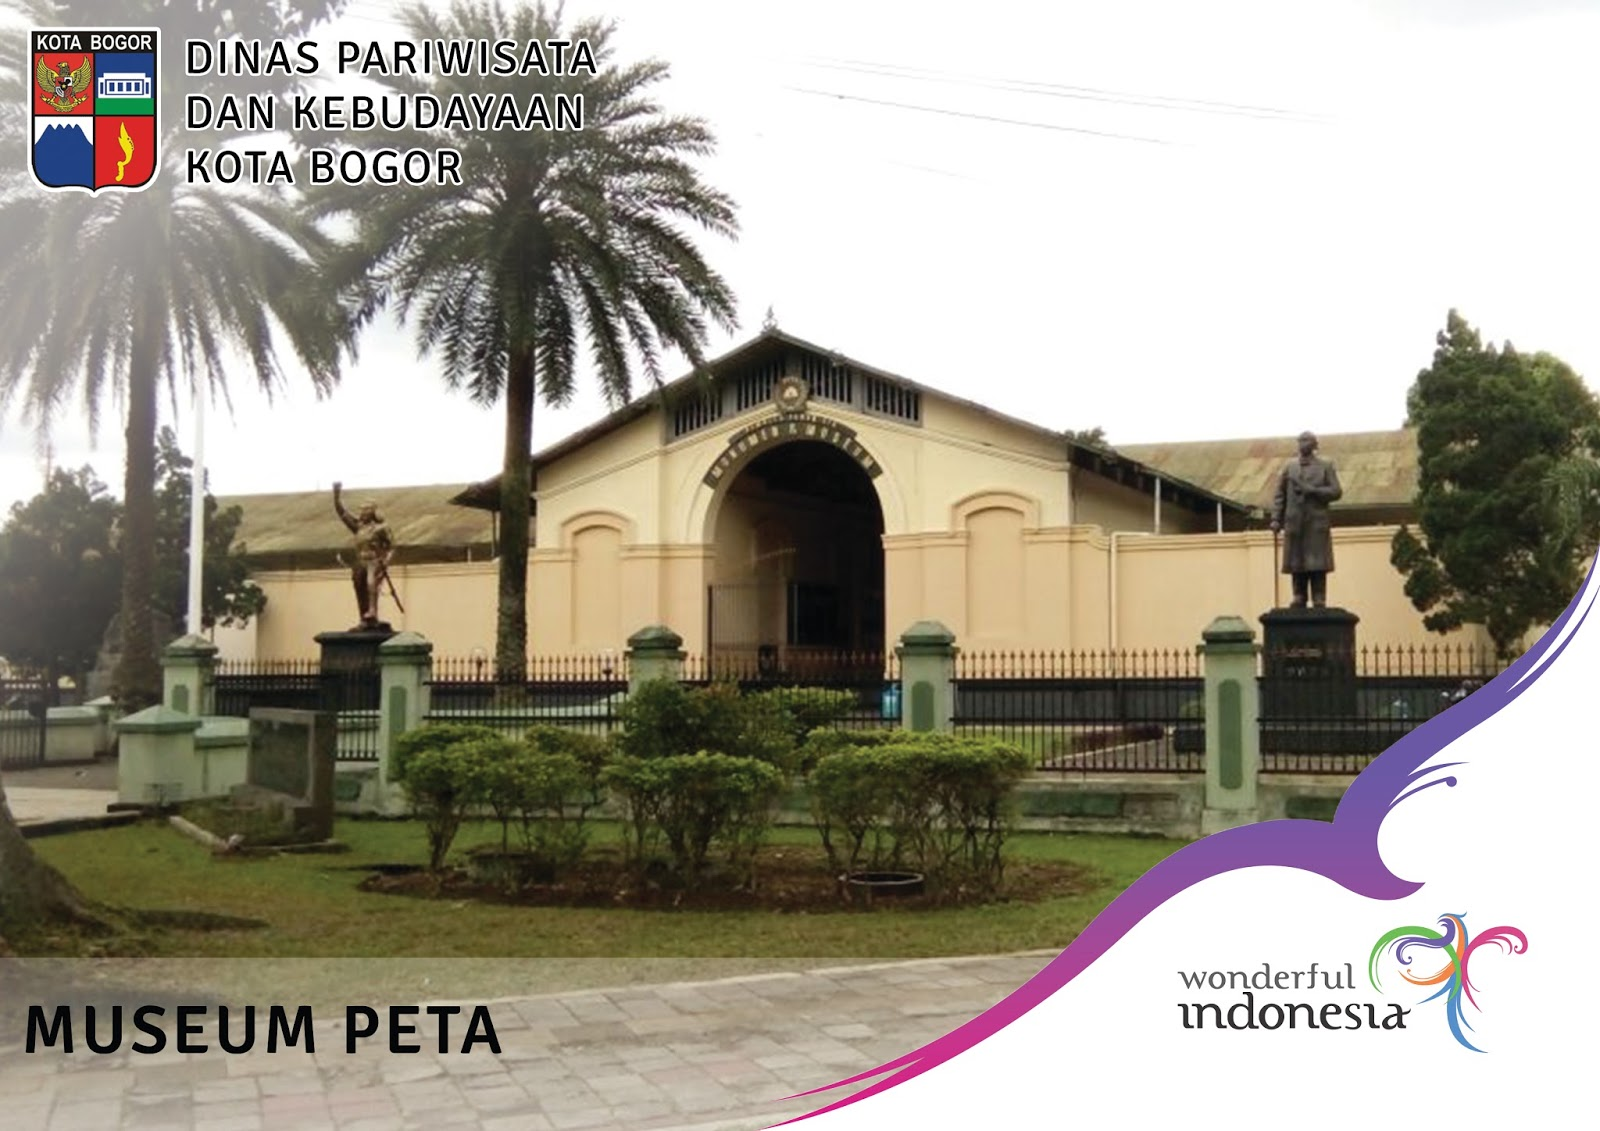 museum pembela tanah air disparbud kota bogor rh disparbud kotabogor blogspot com